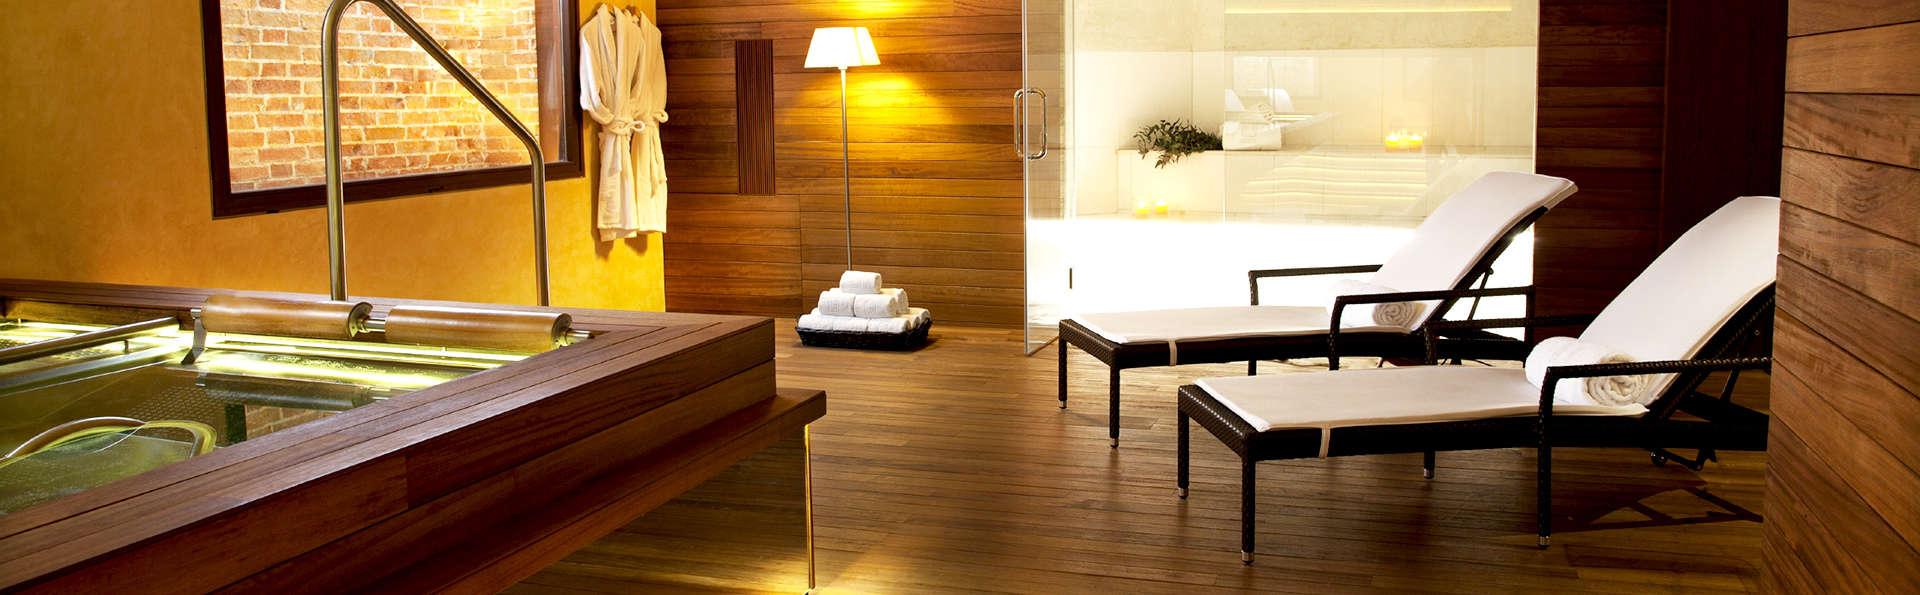 Urso Hotel & Spa - Edit_spa.jpg